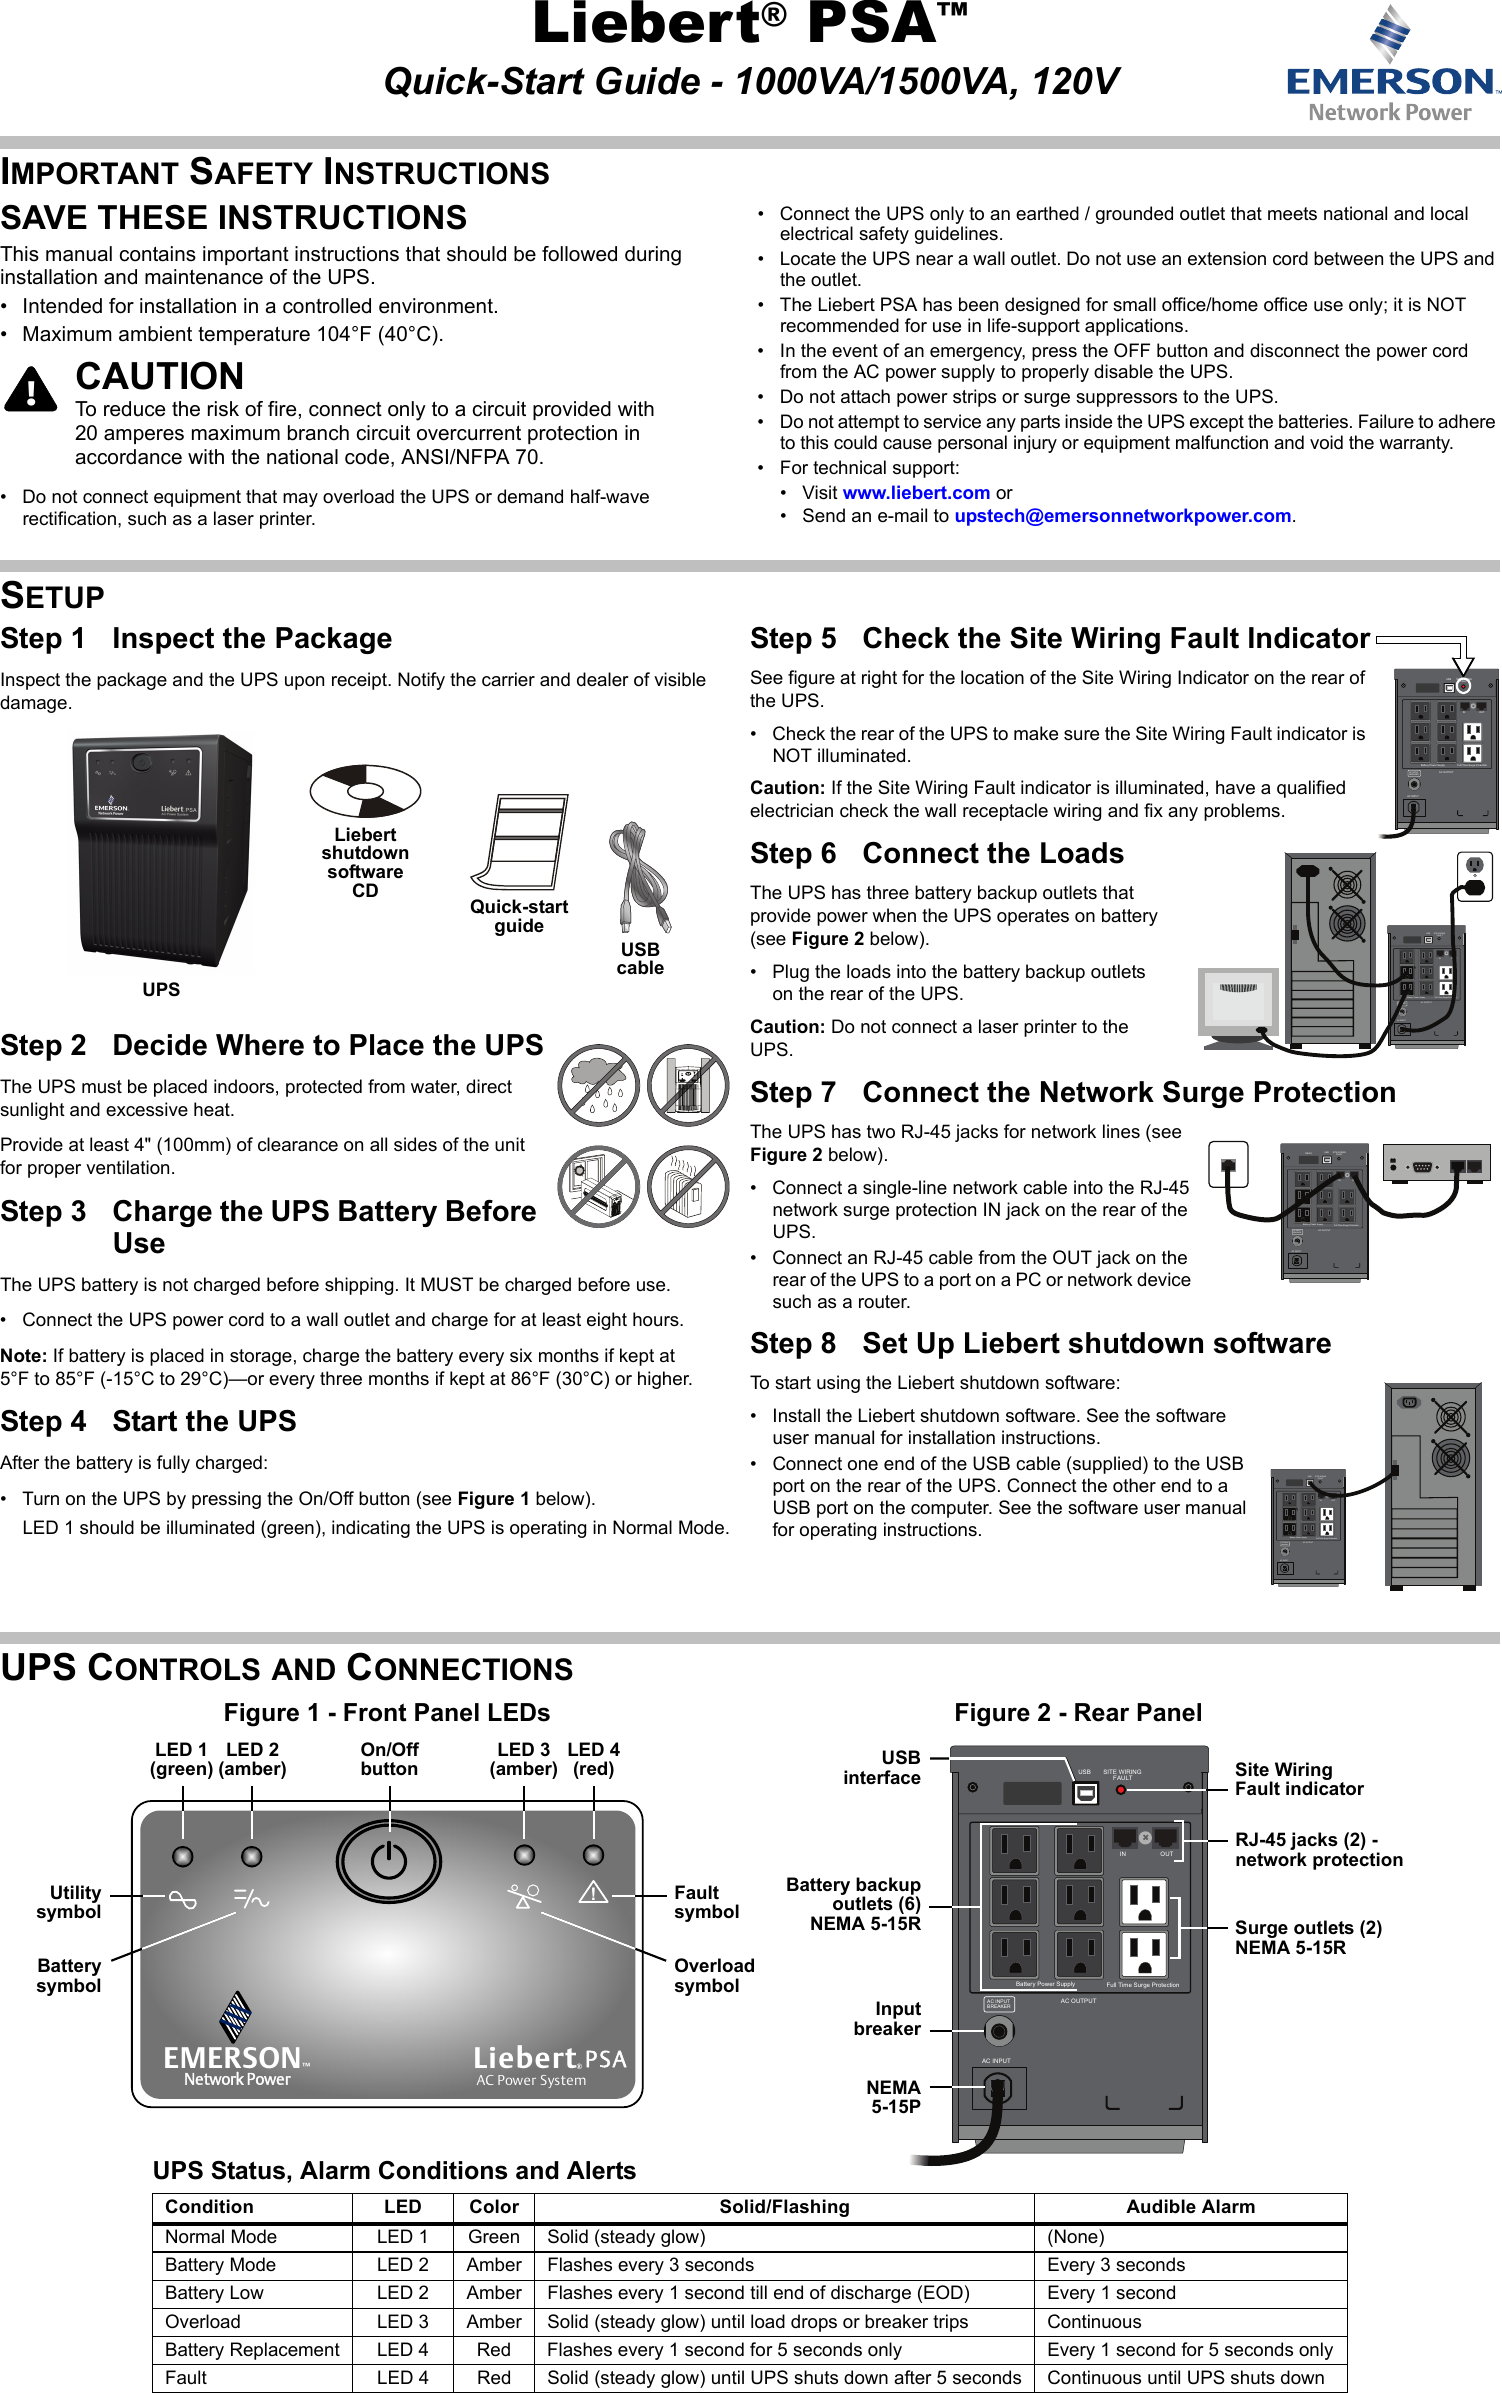 emerson liebert psa line interactive ups 500 1500va quick start manual rh usermanual wiki PSA 3 Brooklyn Insidous 3